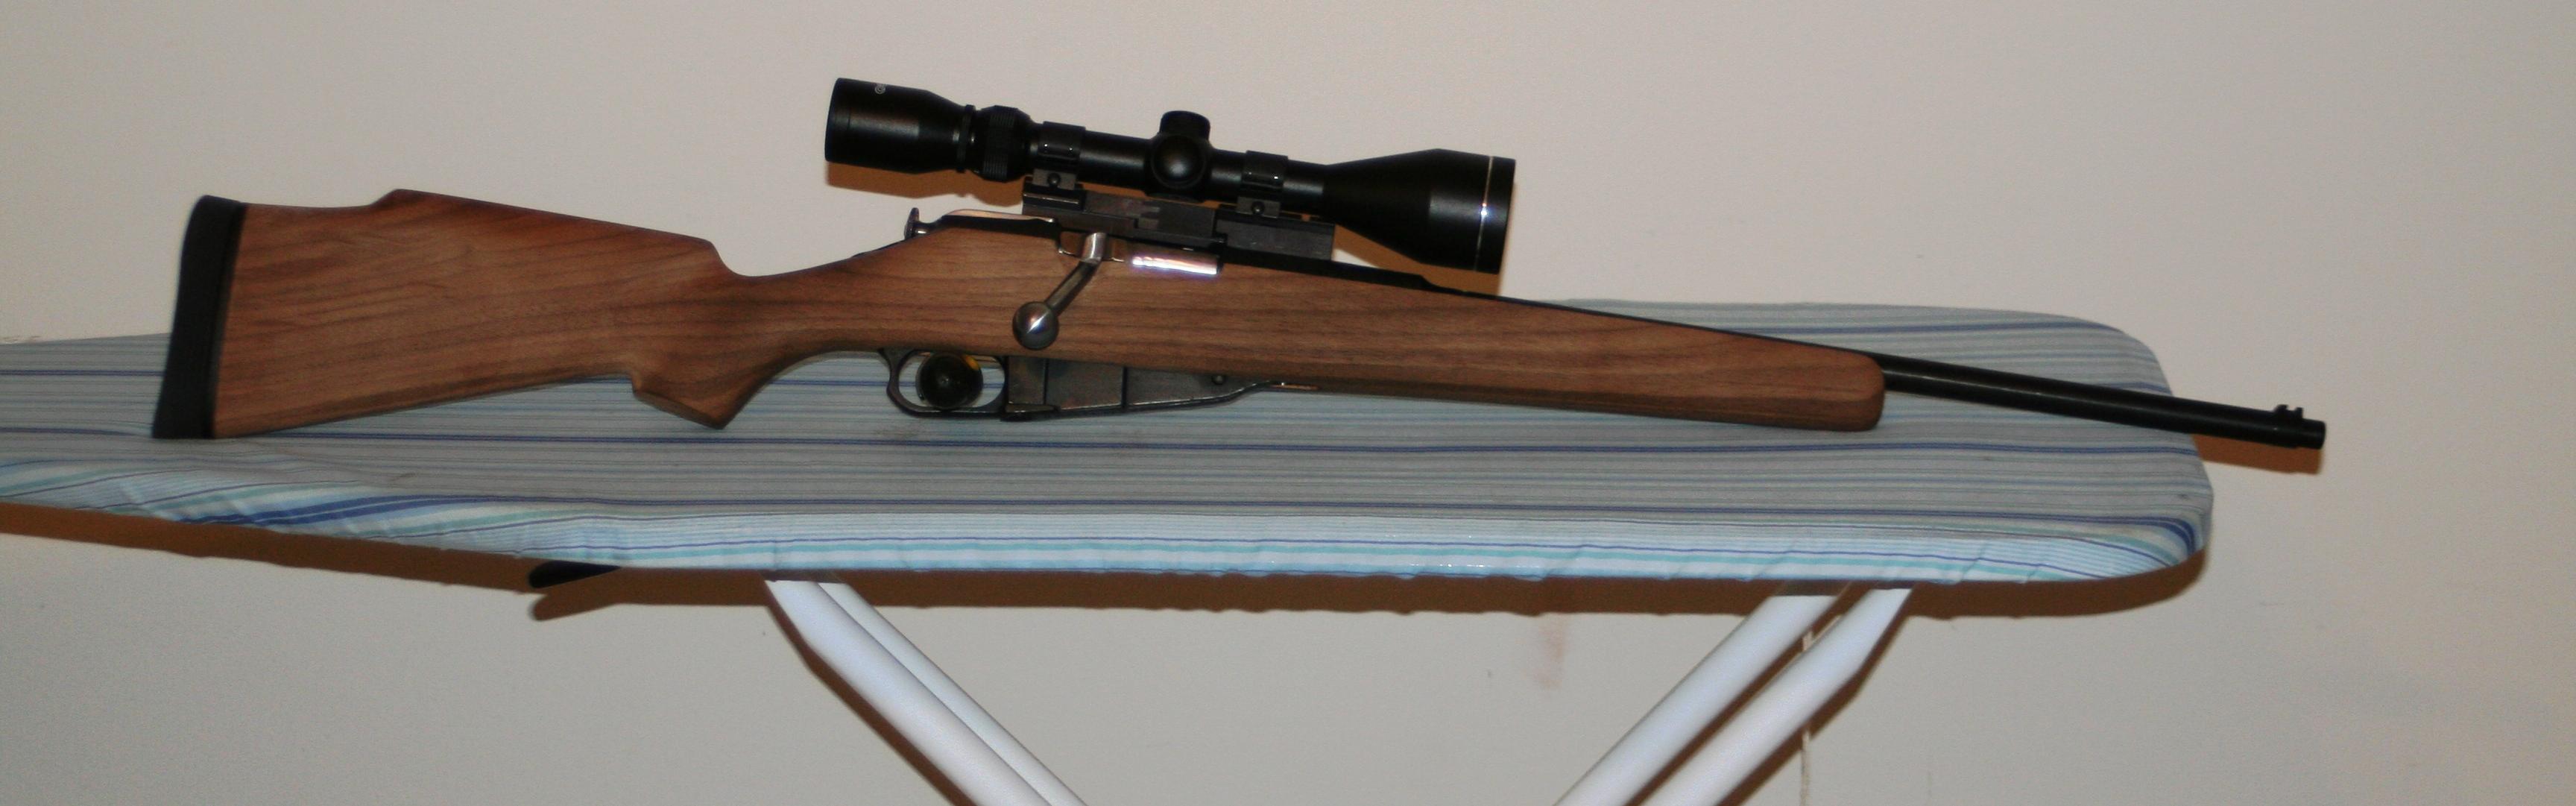 Sporterized Rifles ? | Gun and Game - The Friendliest Gun